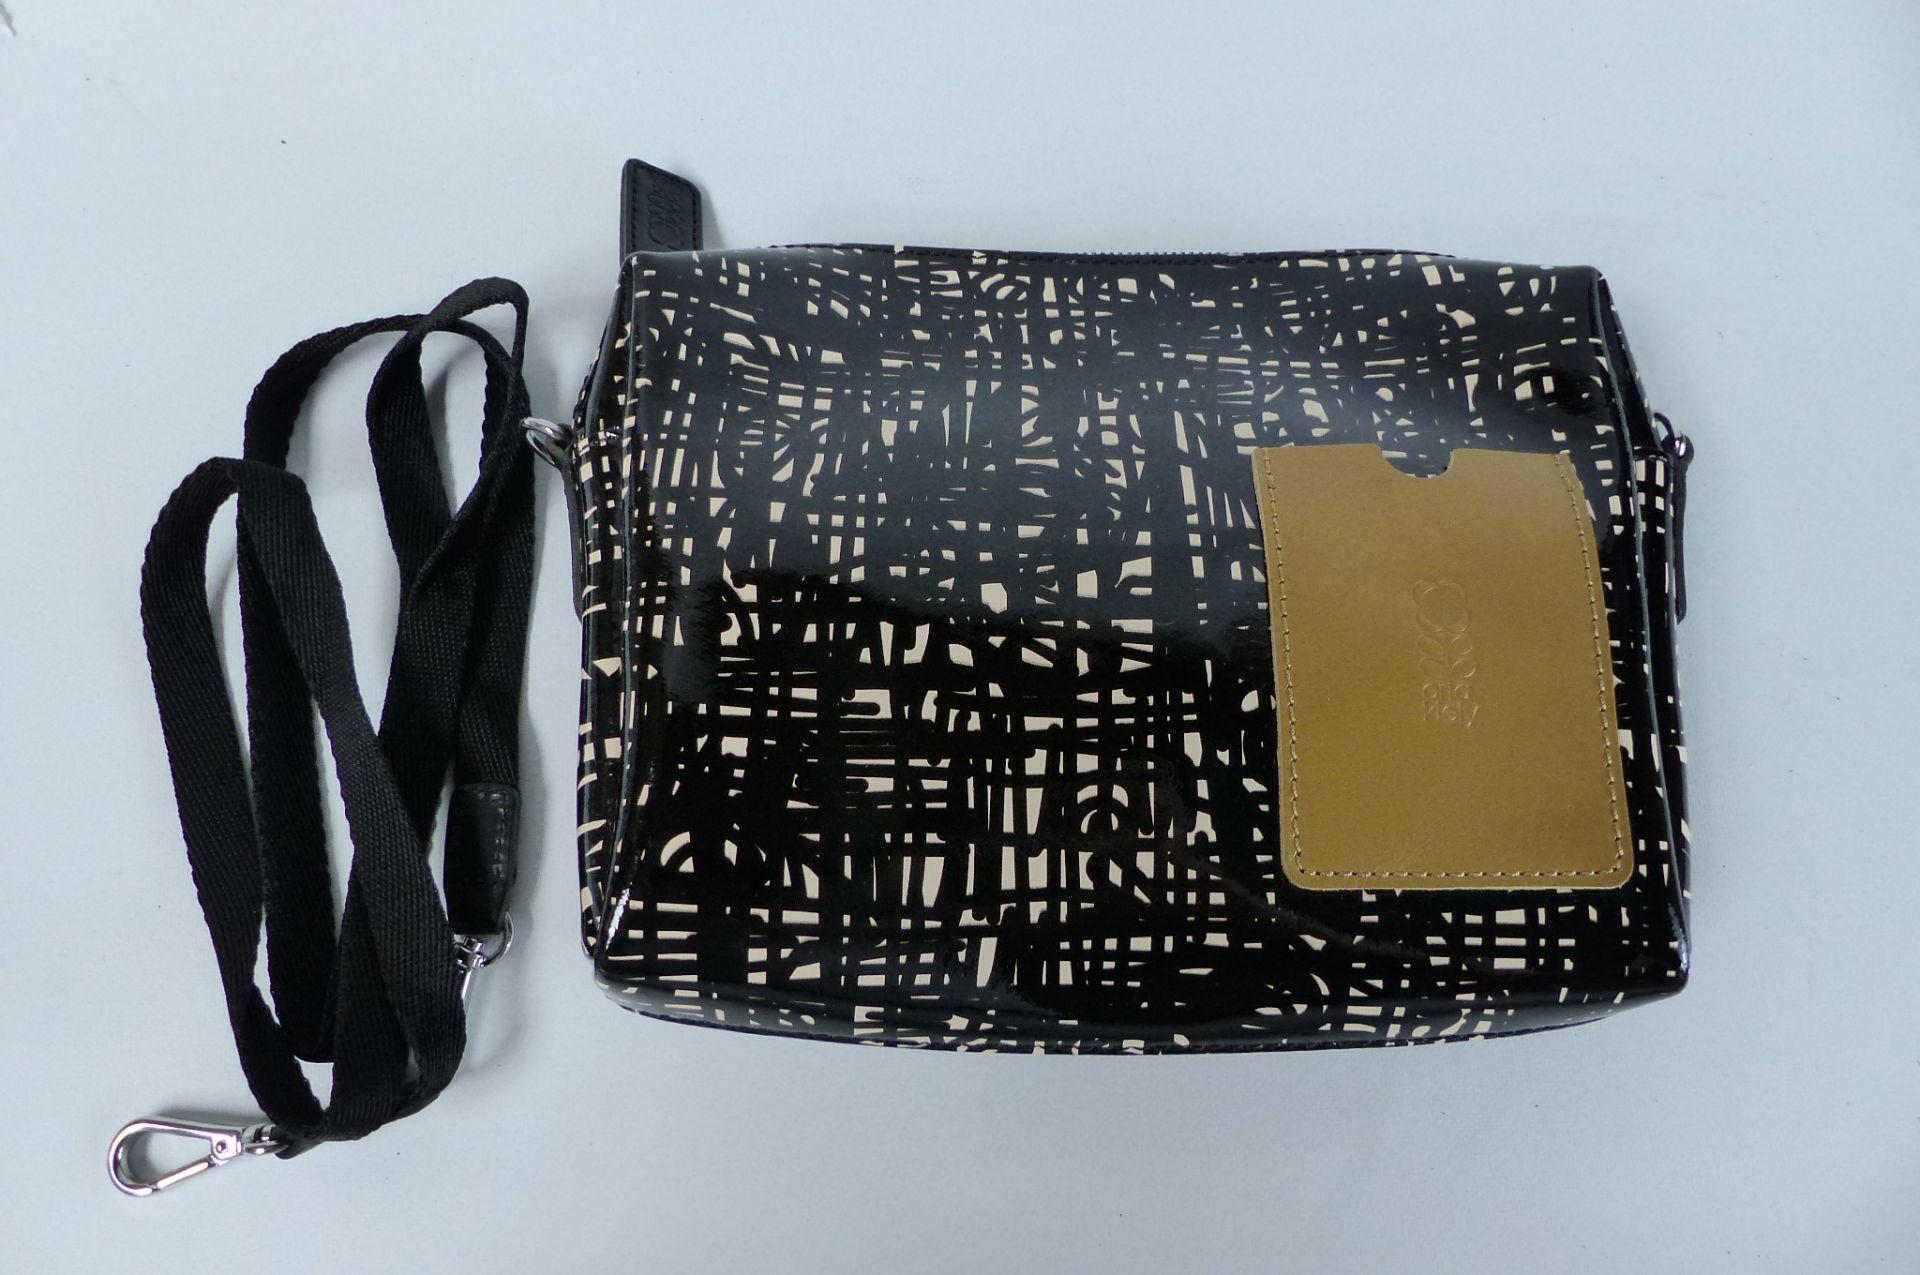 Orla Kiely Textured Leather cross body bag - Image 2 of 2